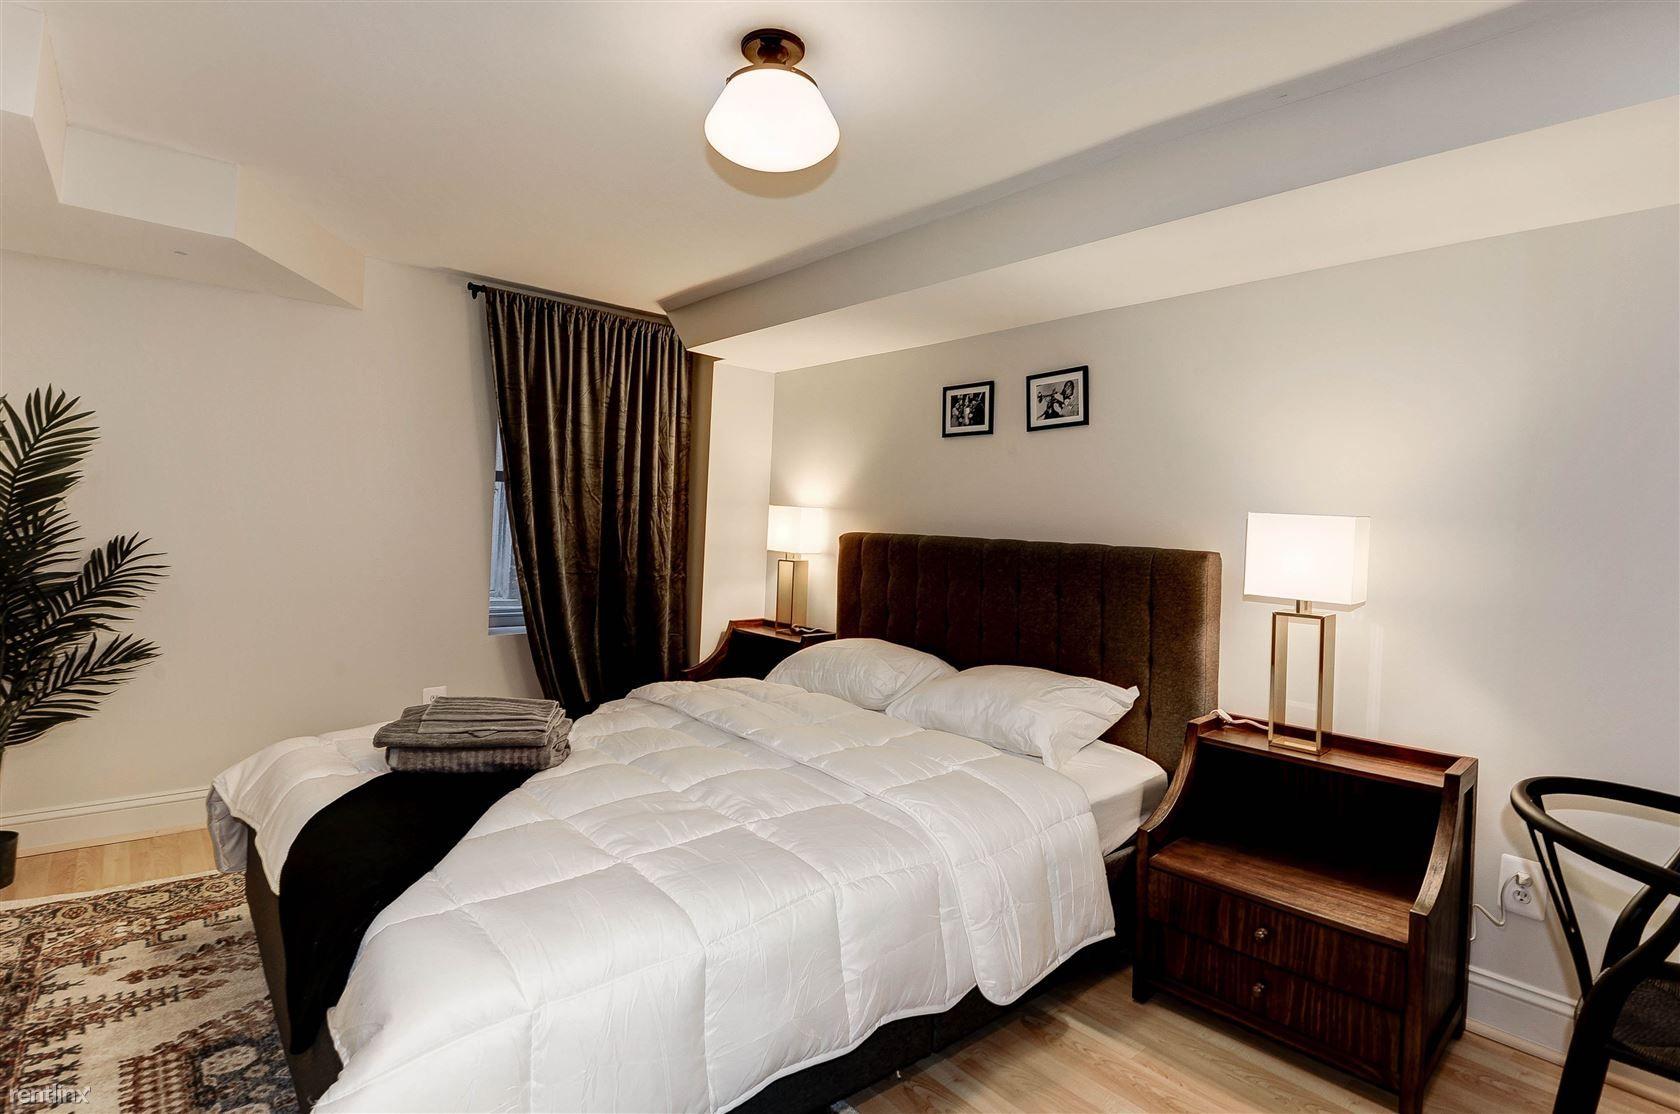 437 10th street NE, Washington DC, DC, 20002 for rent